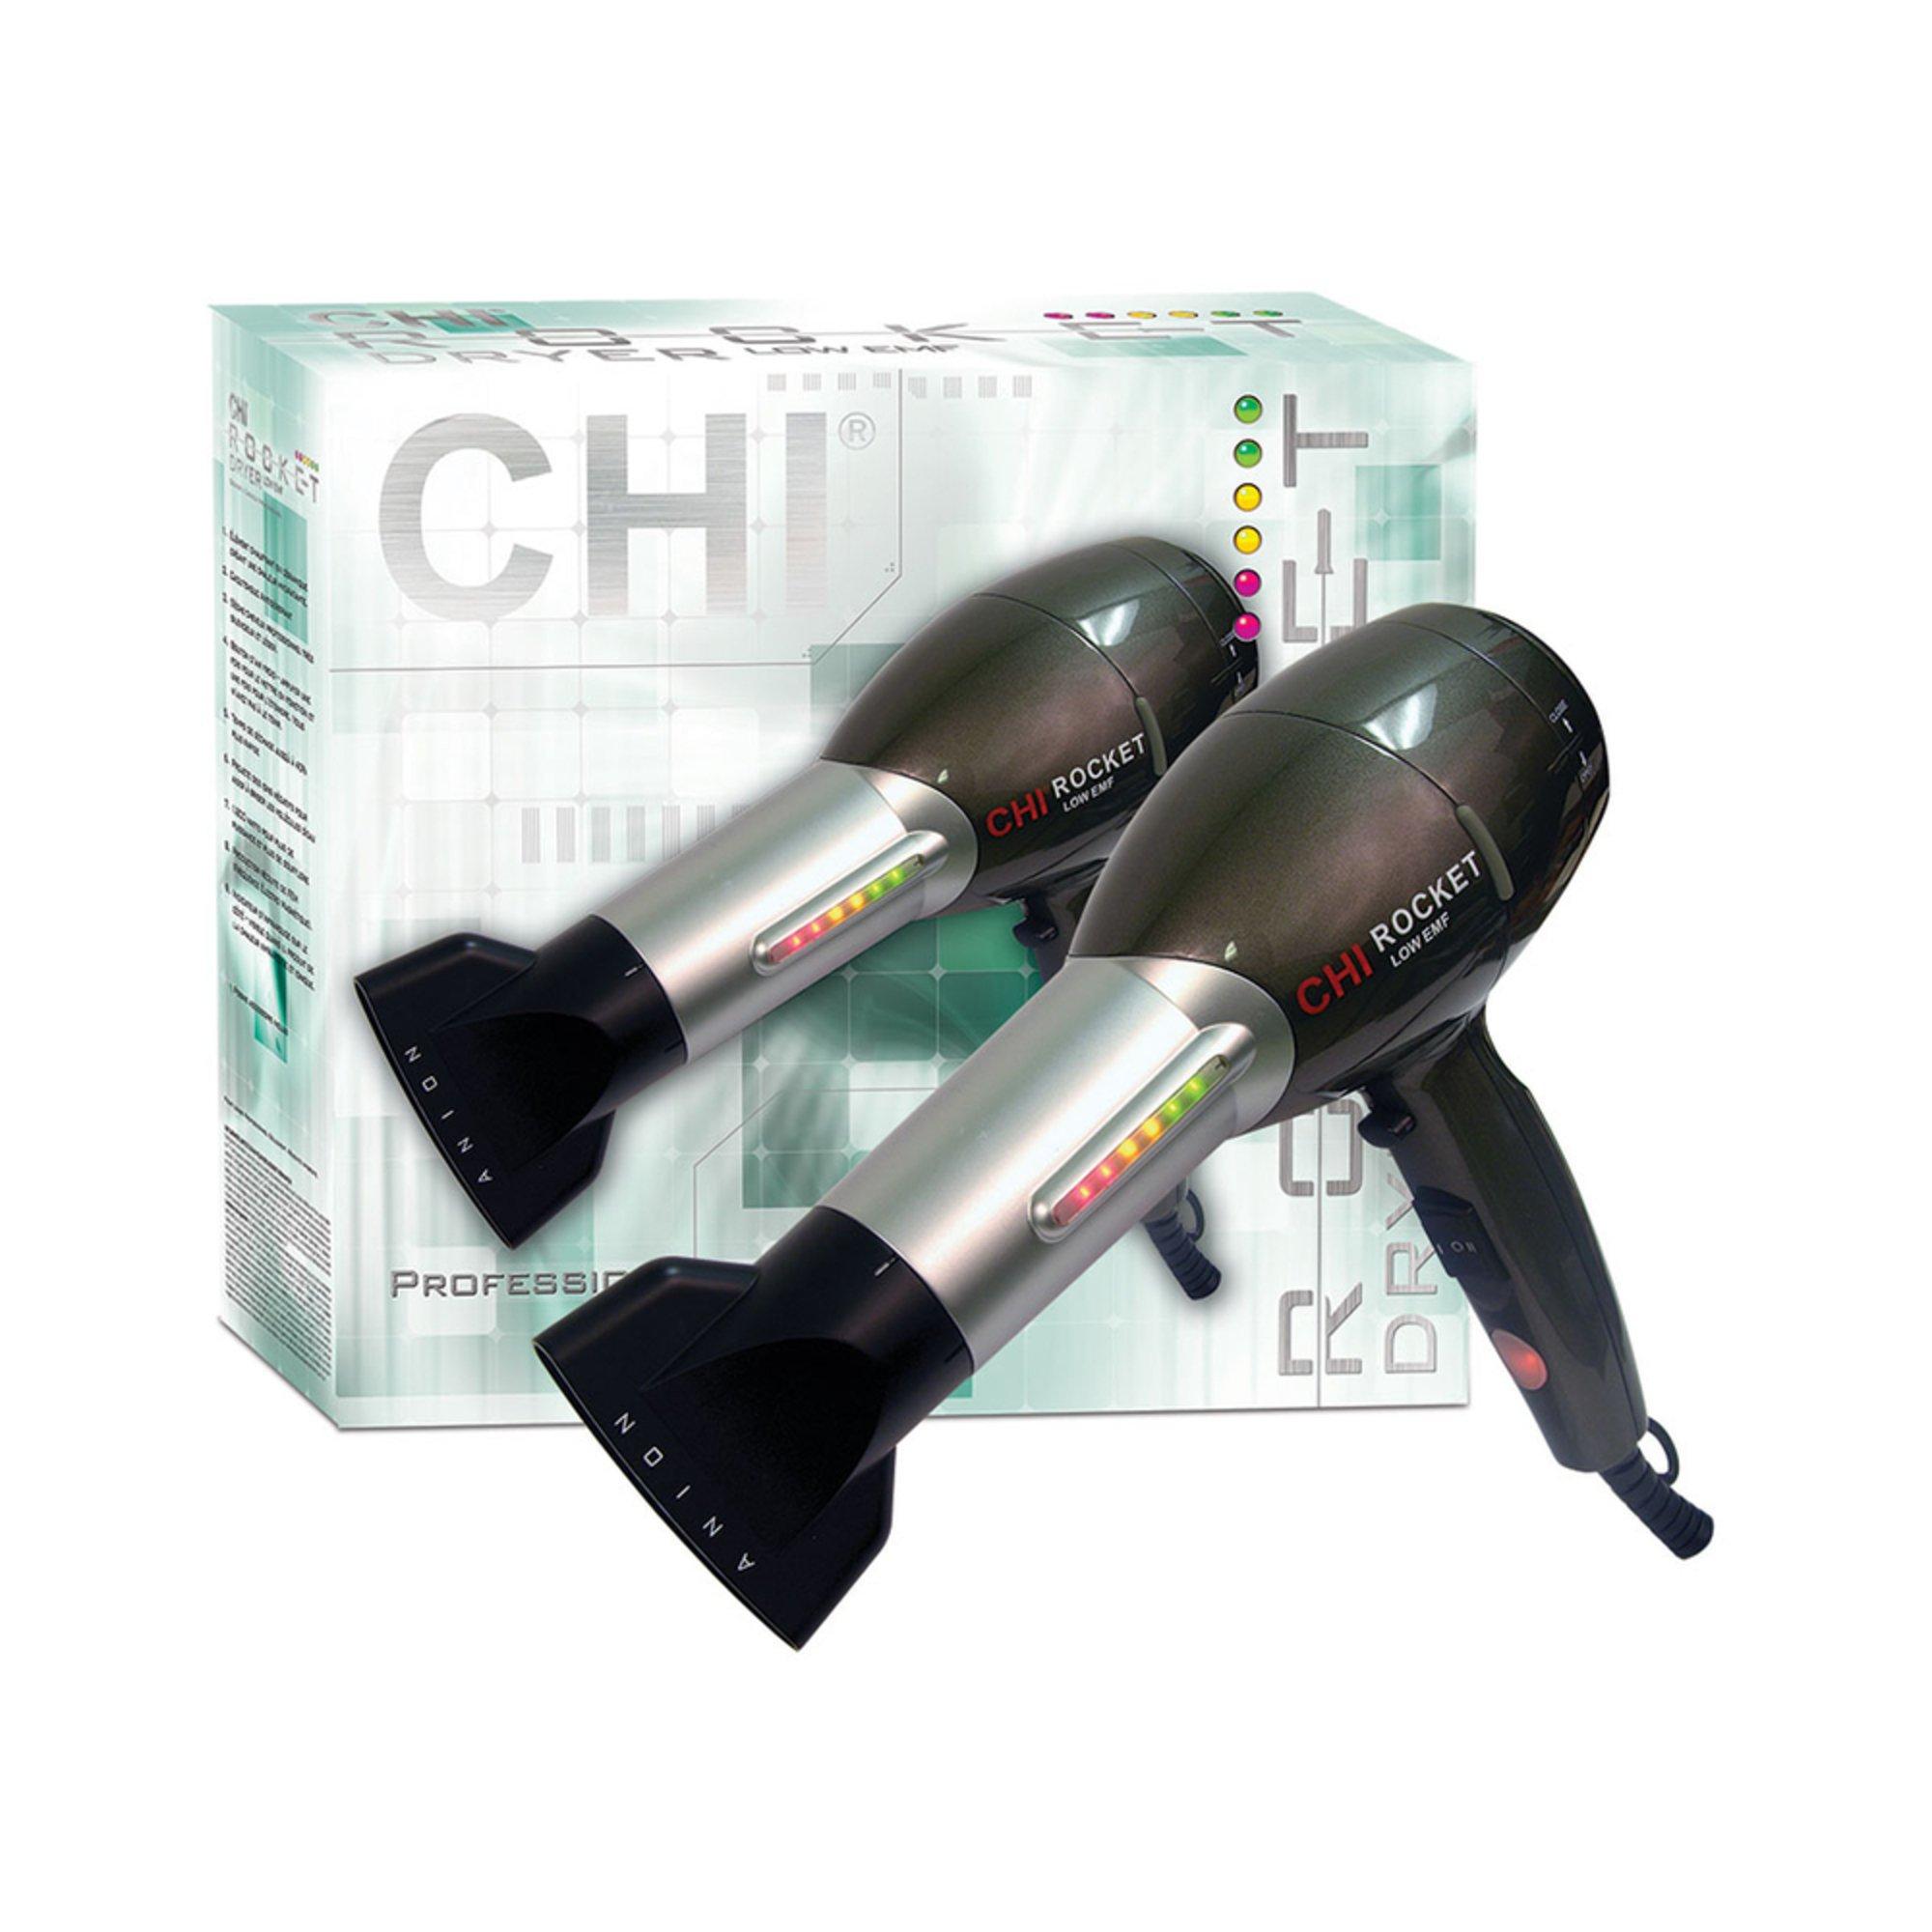 Chi Rocket Professional Hair Dryer 1800w | Hair Dryers